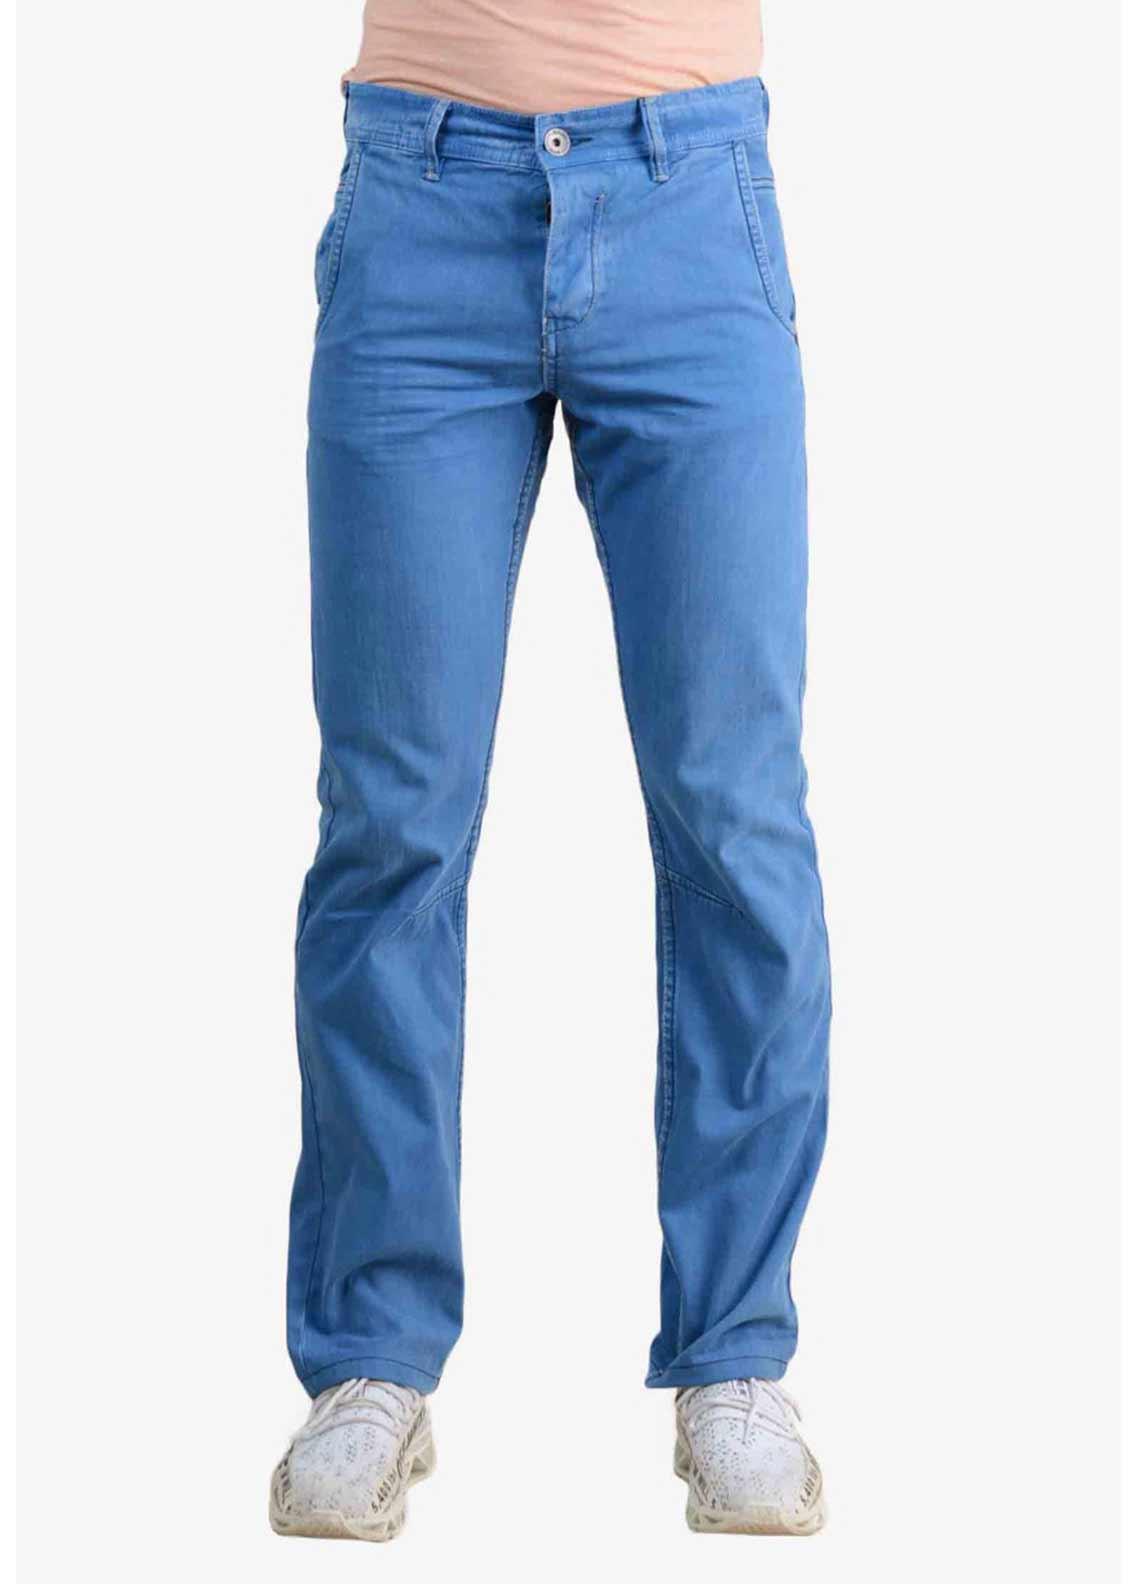 Ignite Wardrobe Denim Straight Jeans for Men -  Sky Blue